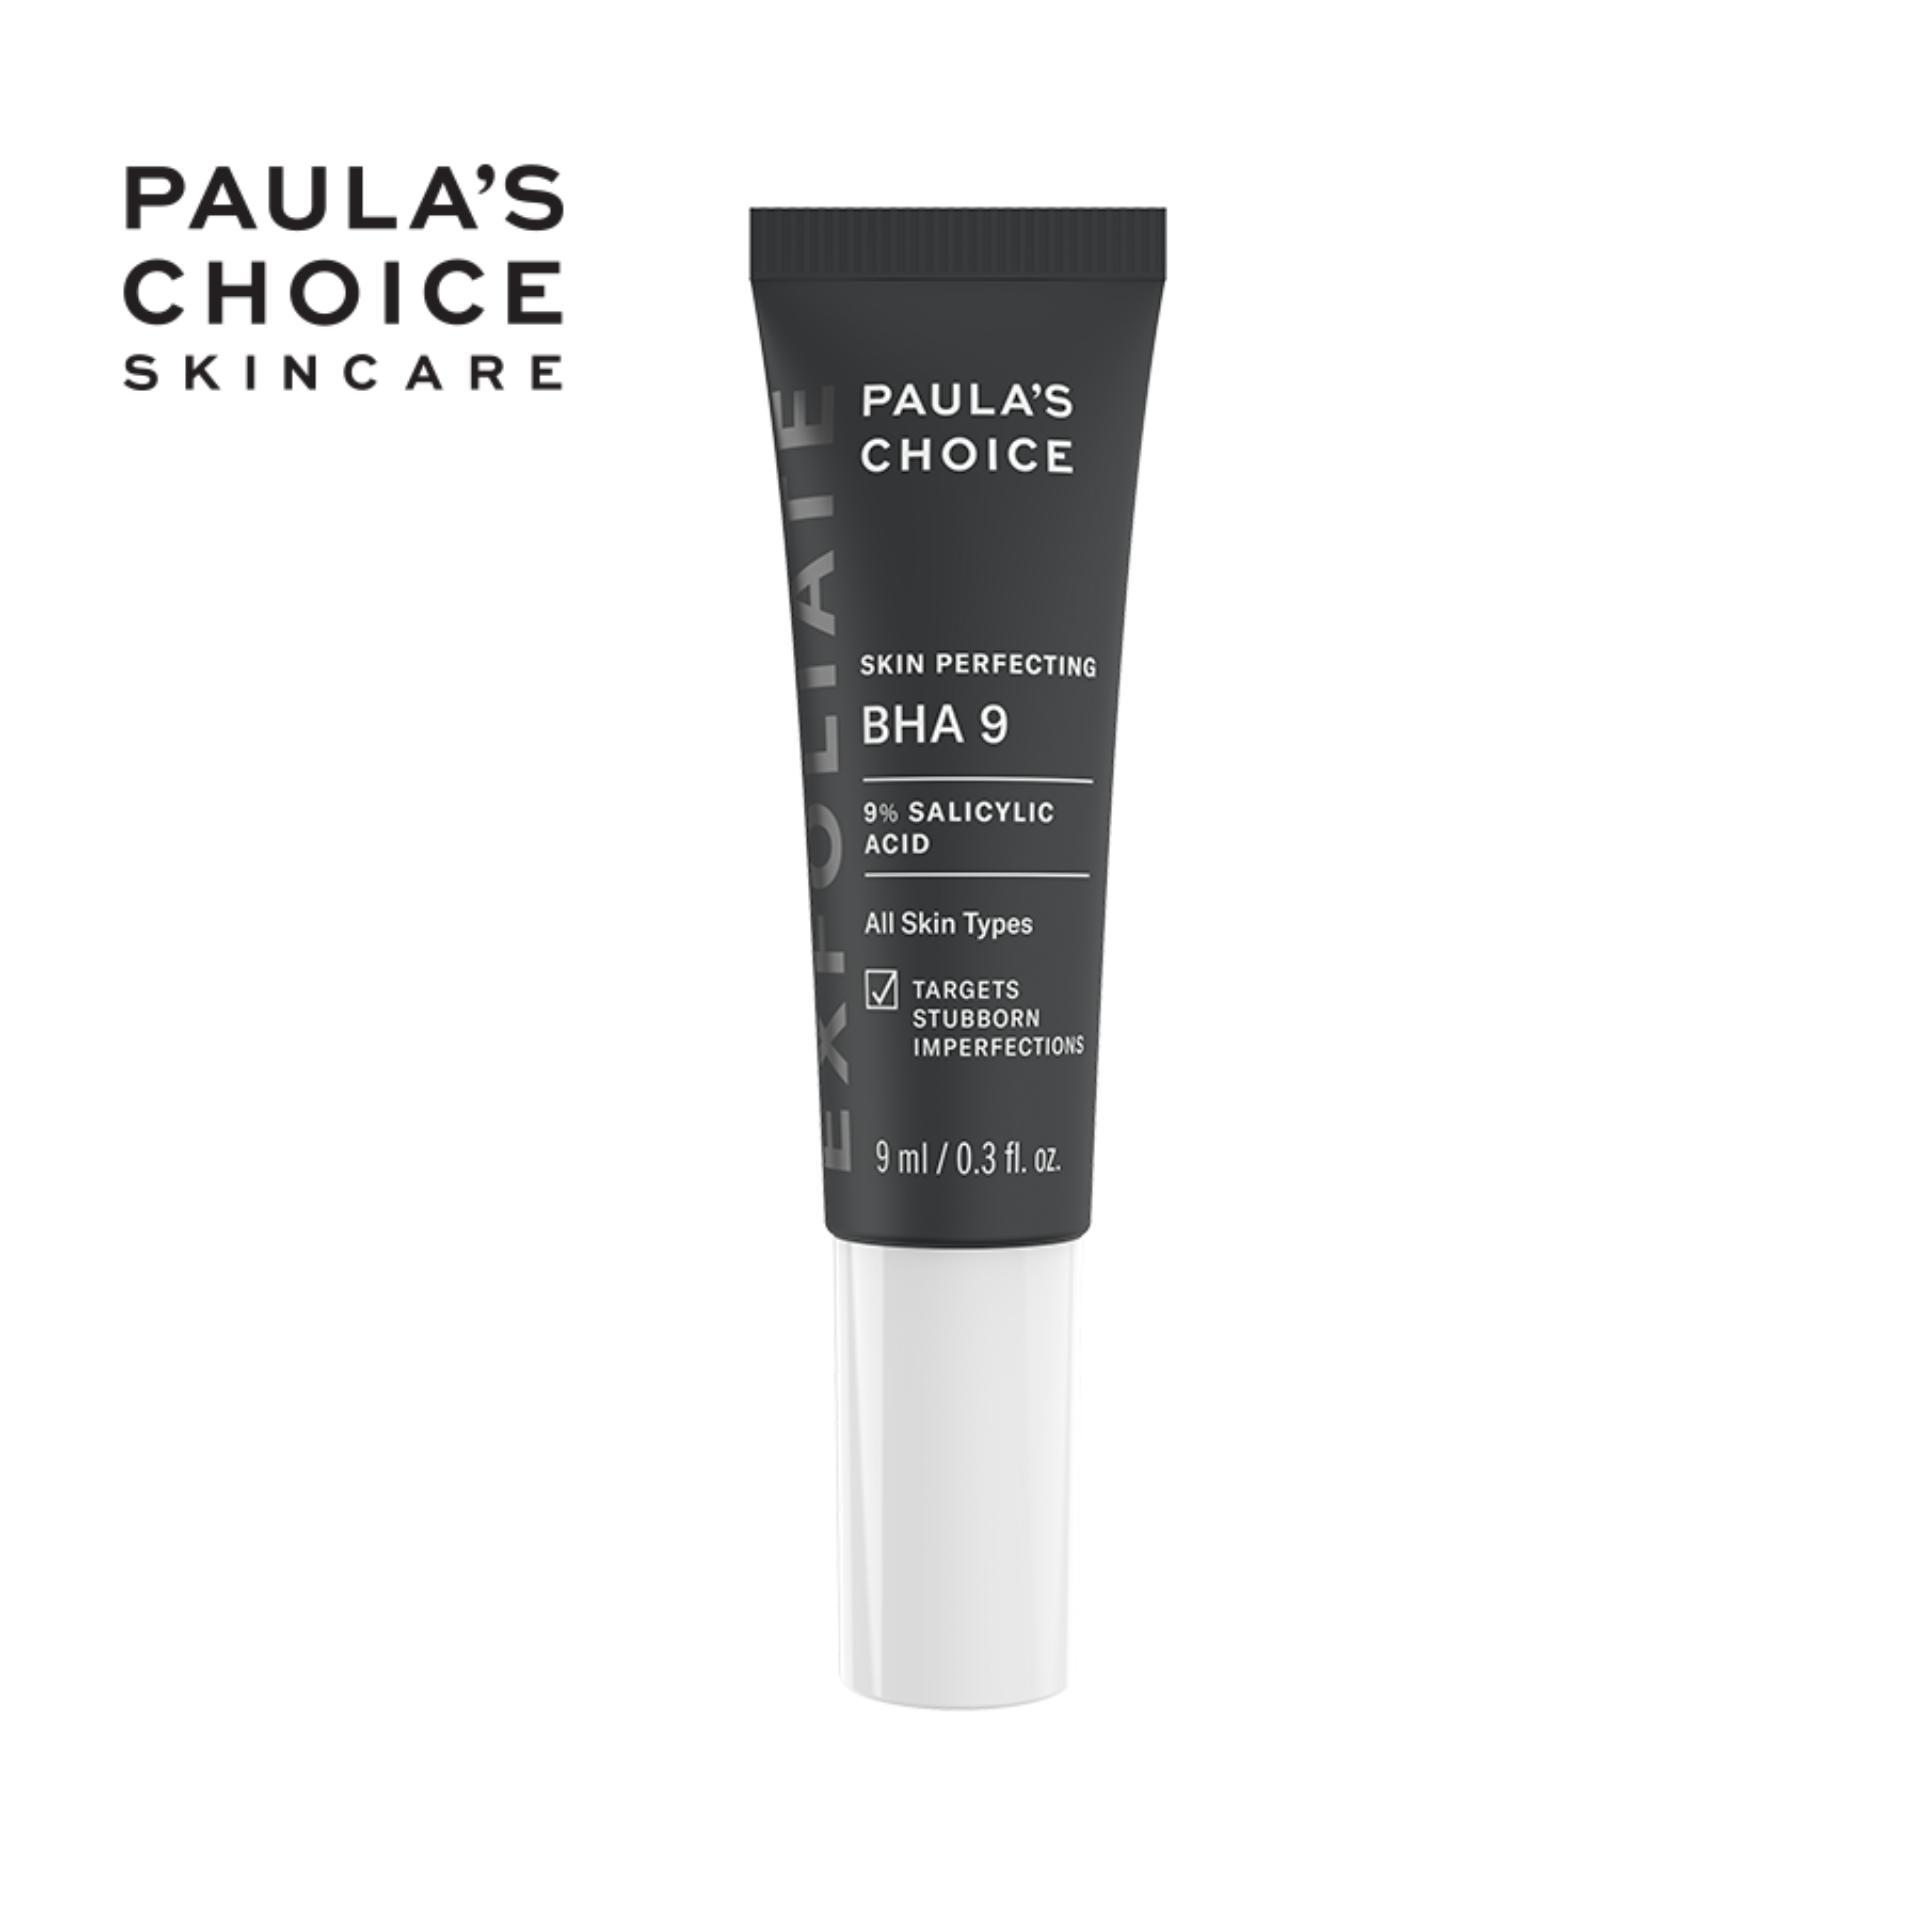 Tinh chất giảm thiểu mụn cao cấp 9% BHA Paula's Choice Resist BHA 9 7730